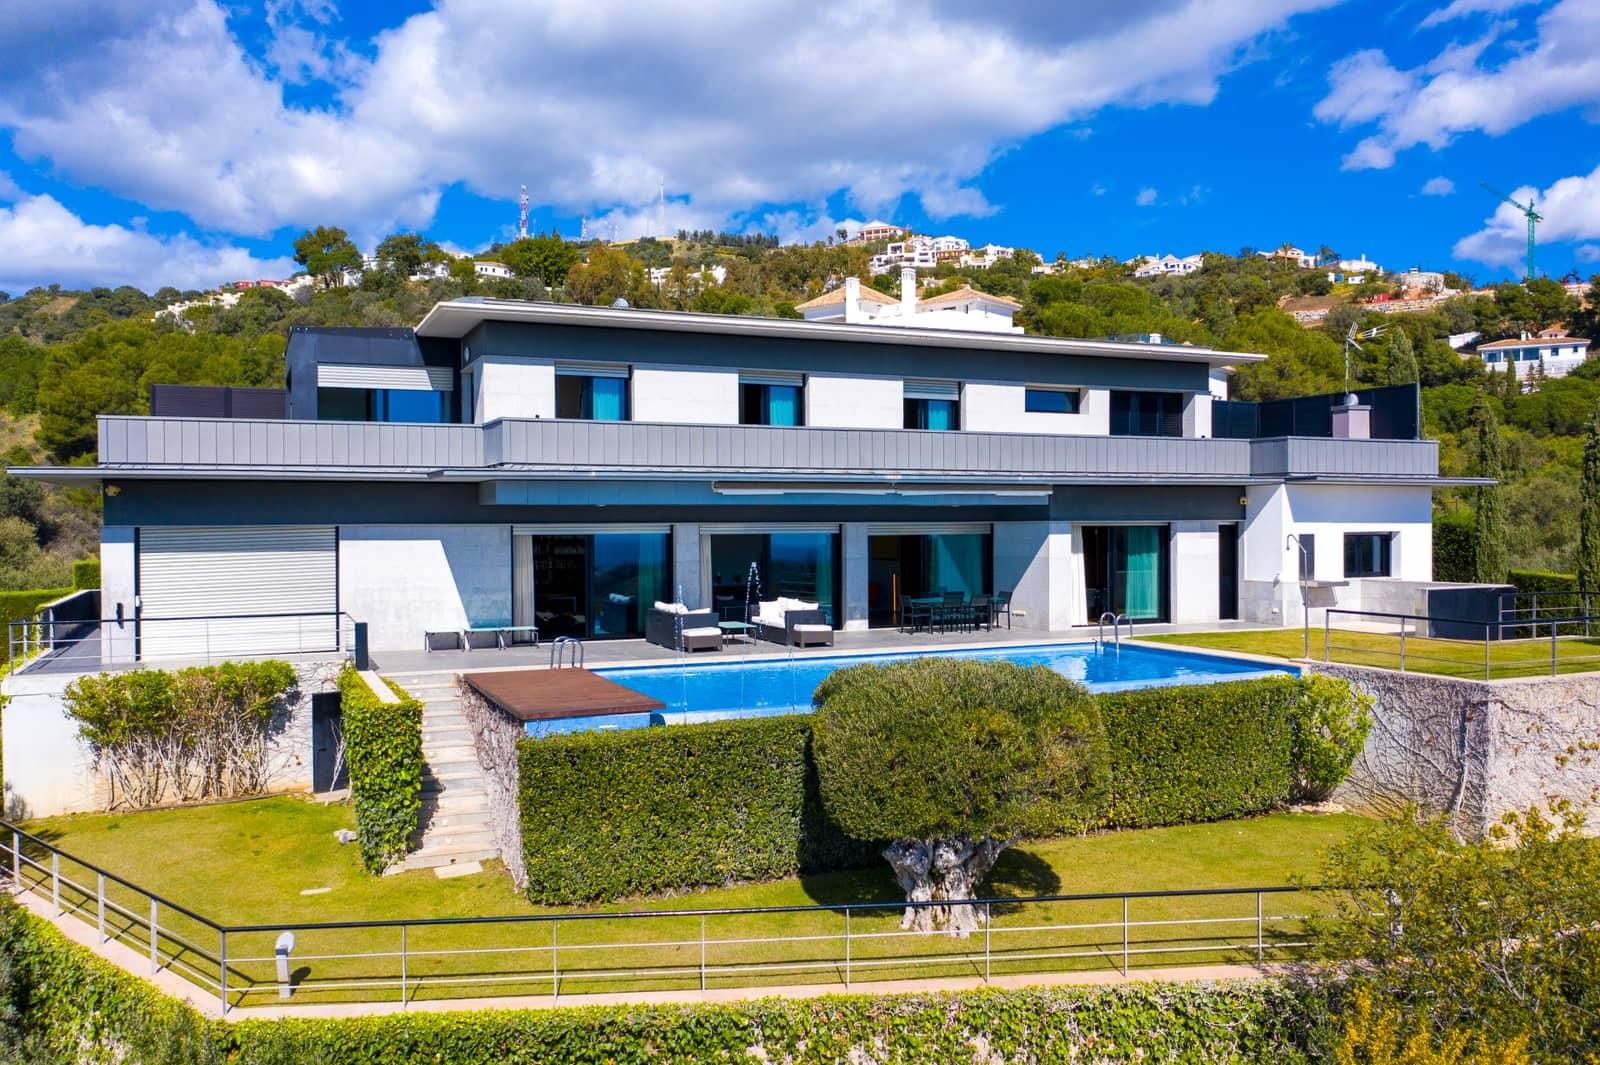 5 bedroom Villa for sale in Marbella with pool - € 3,500,000 (Ref: 5945371)